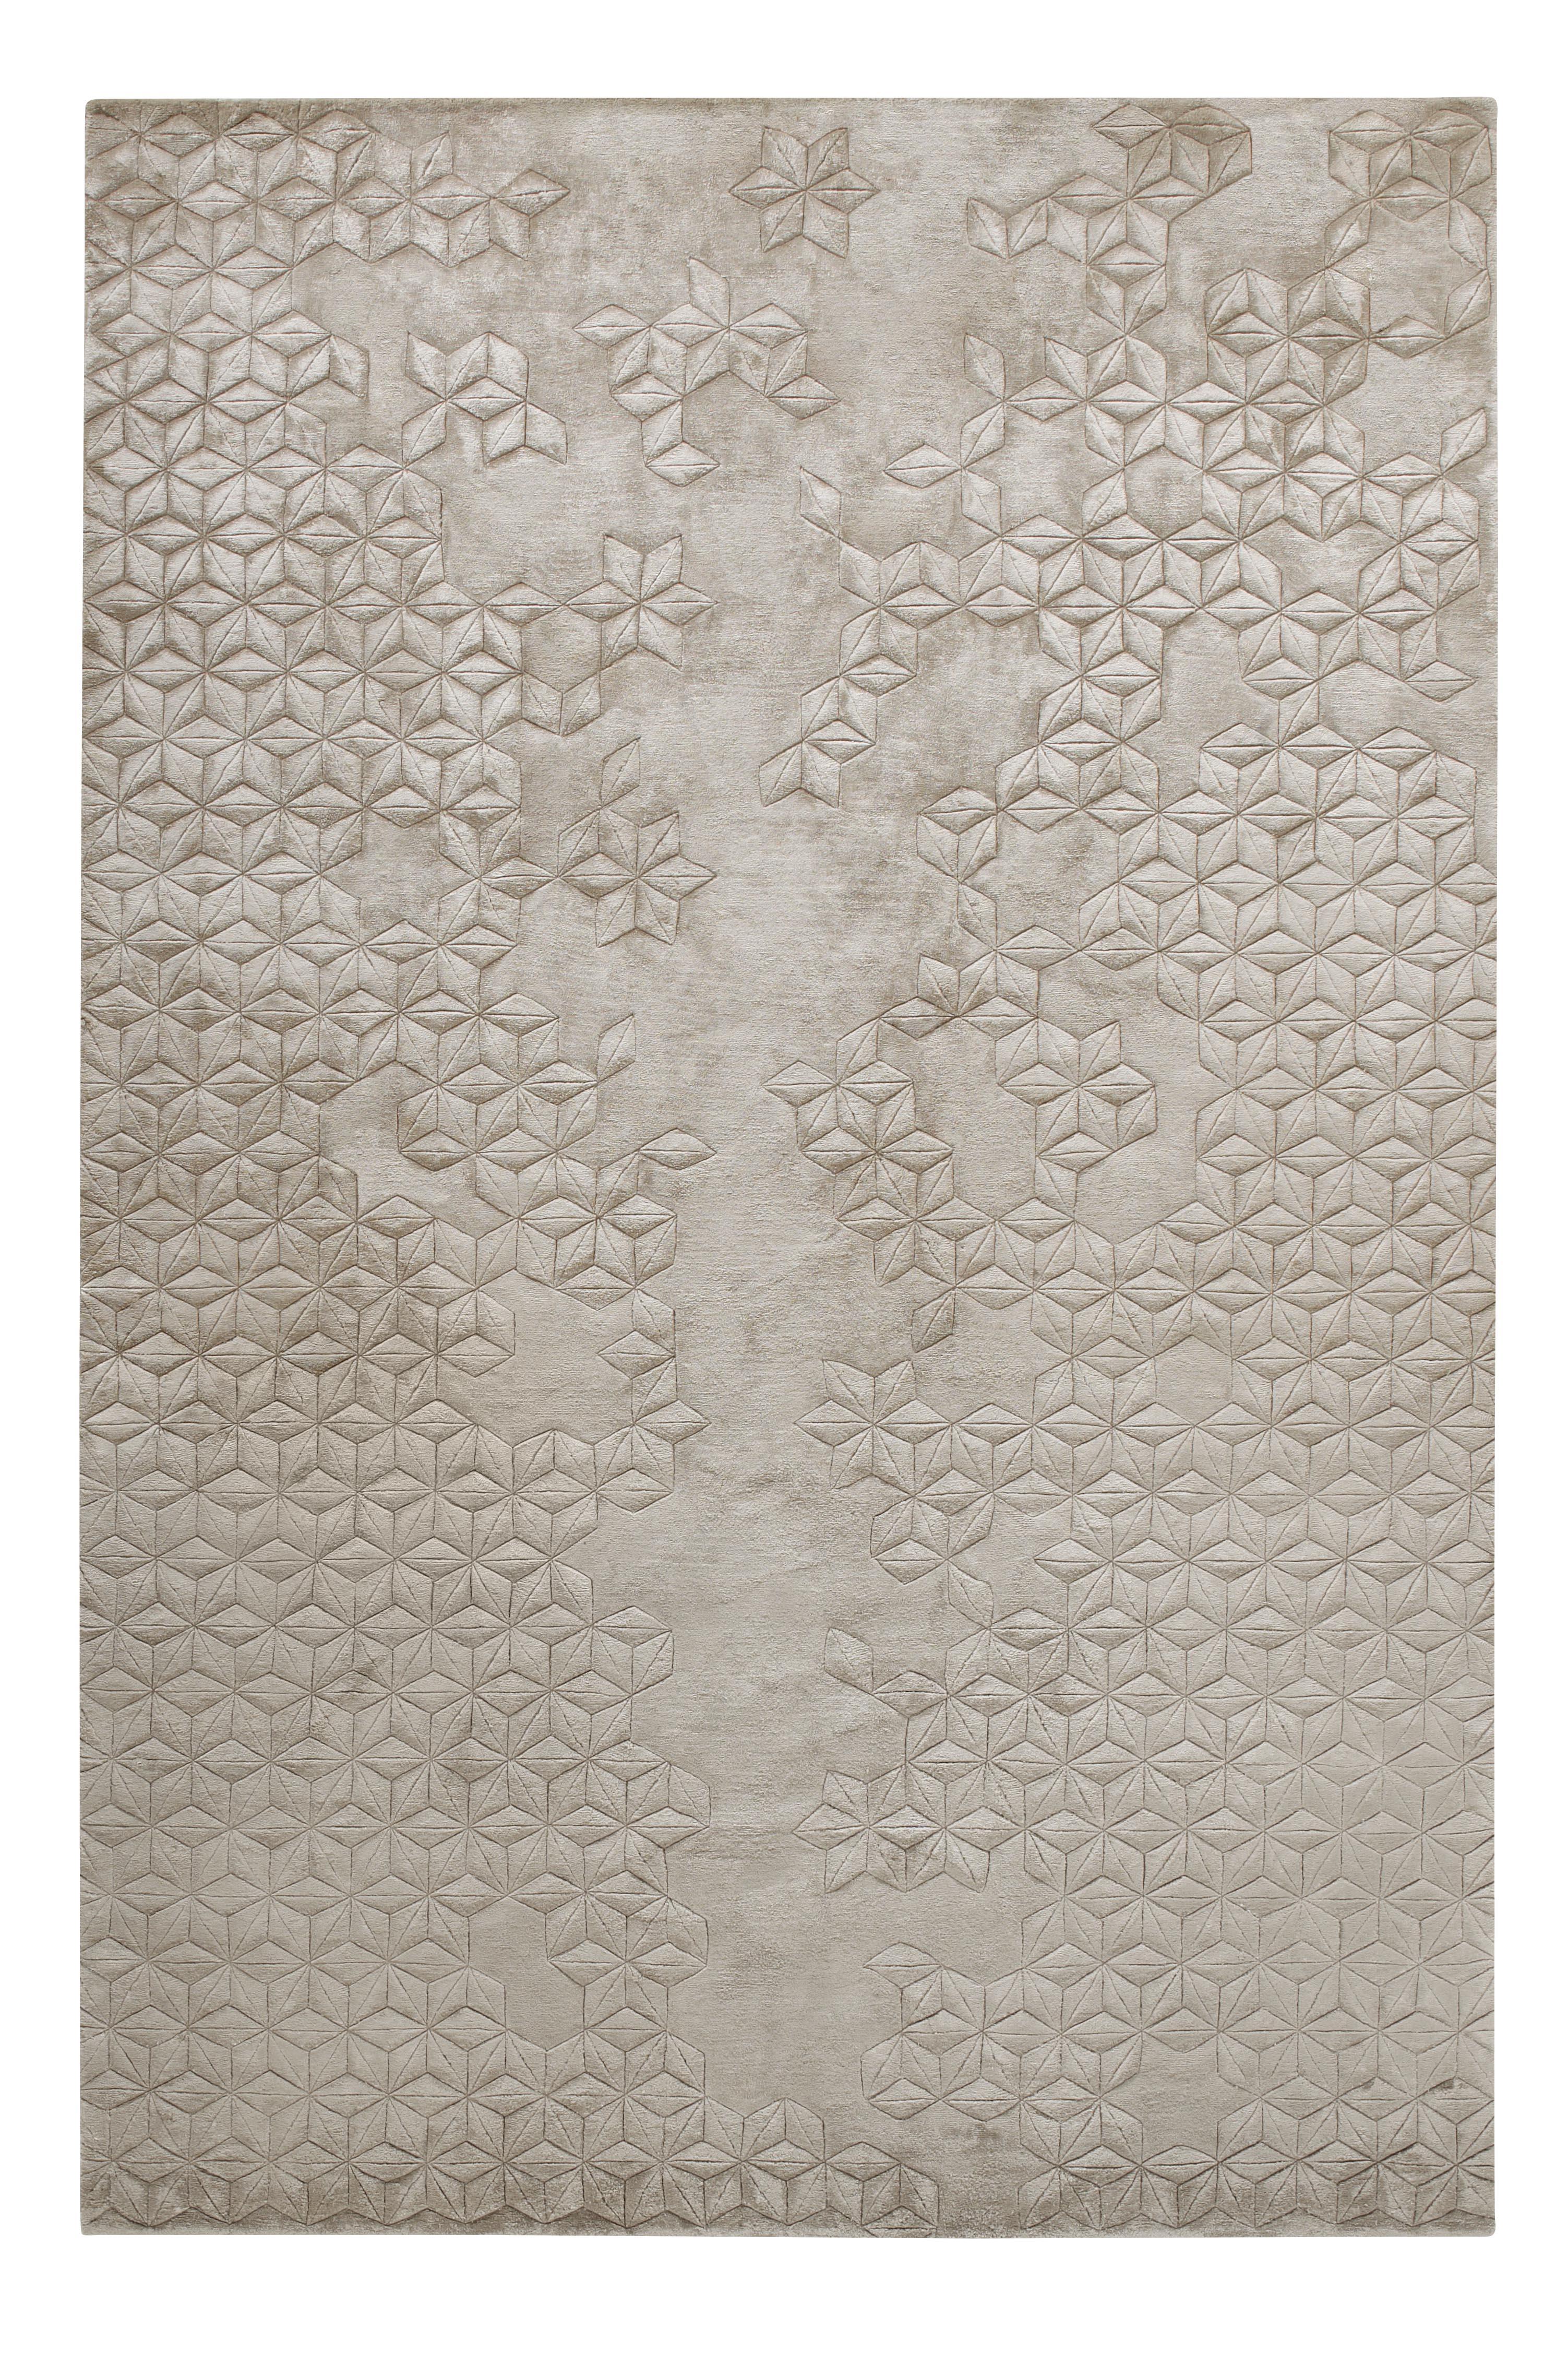 silk rug texture star silk rug by helen amy murray - abstract patterned geometric new - AUBAFSJ